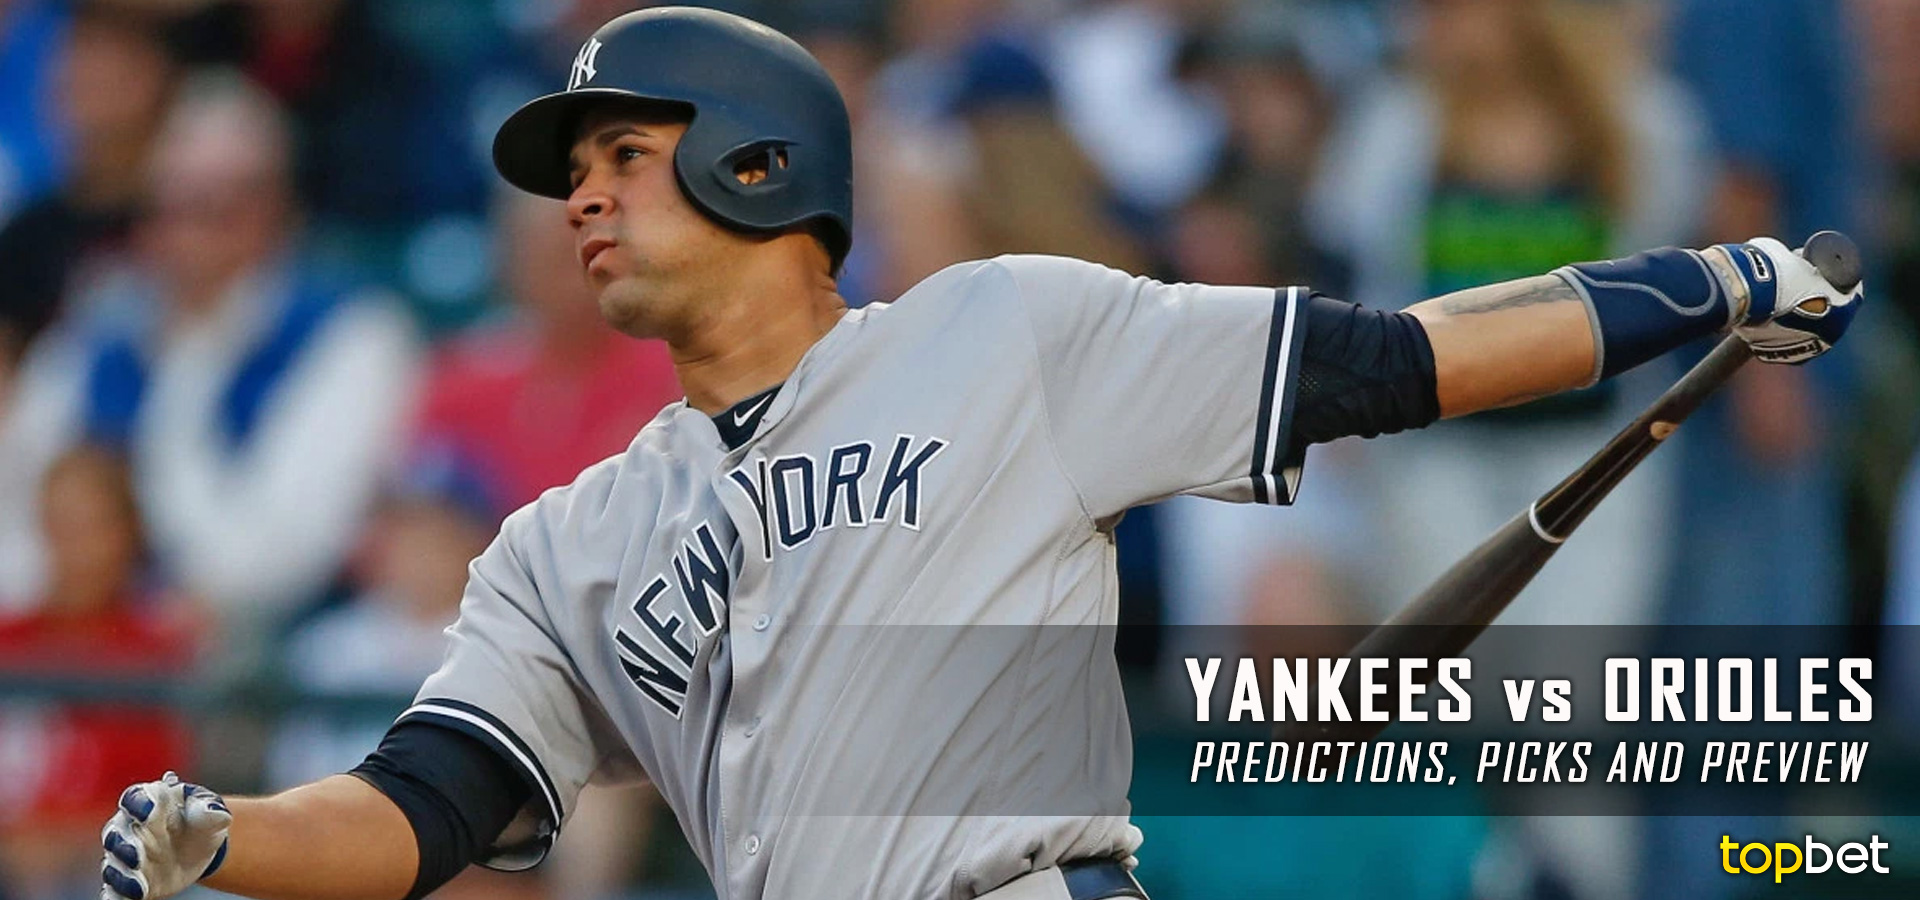 Yankees vs Orioles Predictions and Picks – September 2, 2016